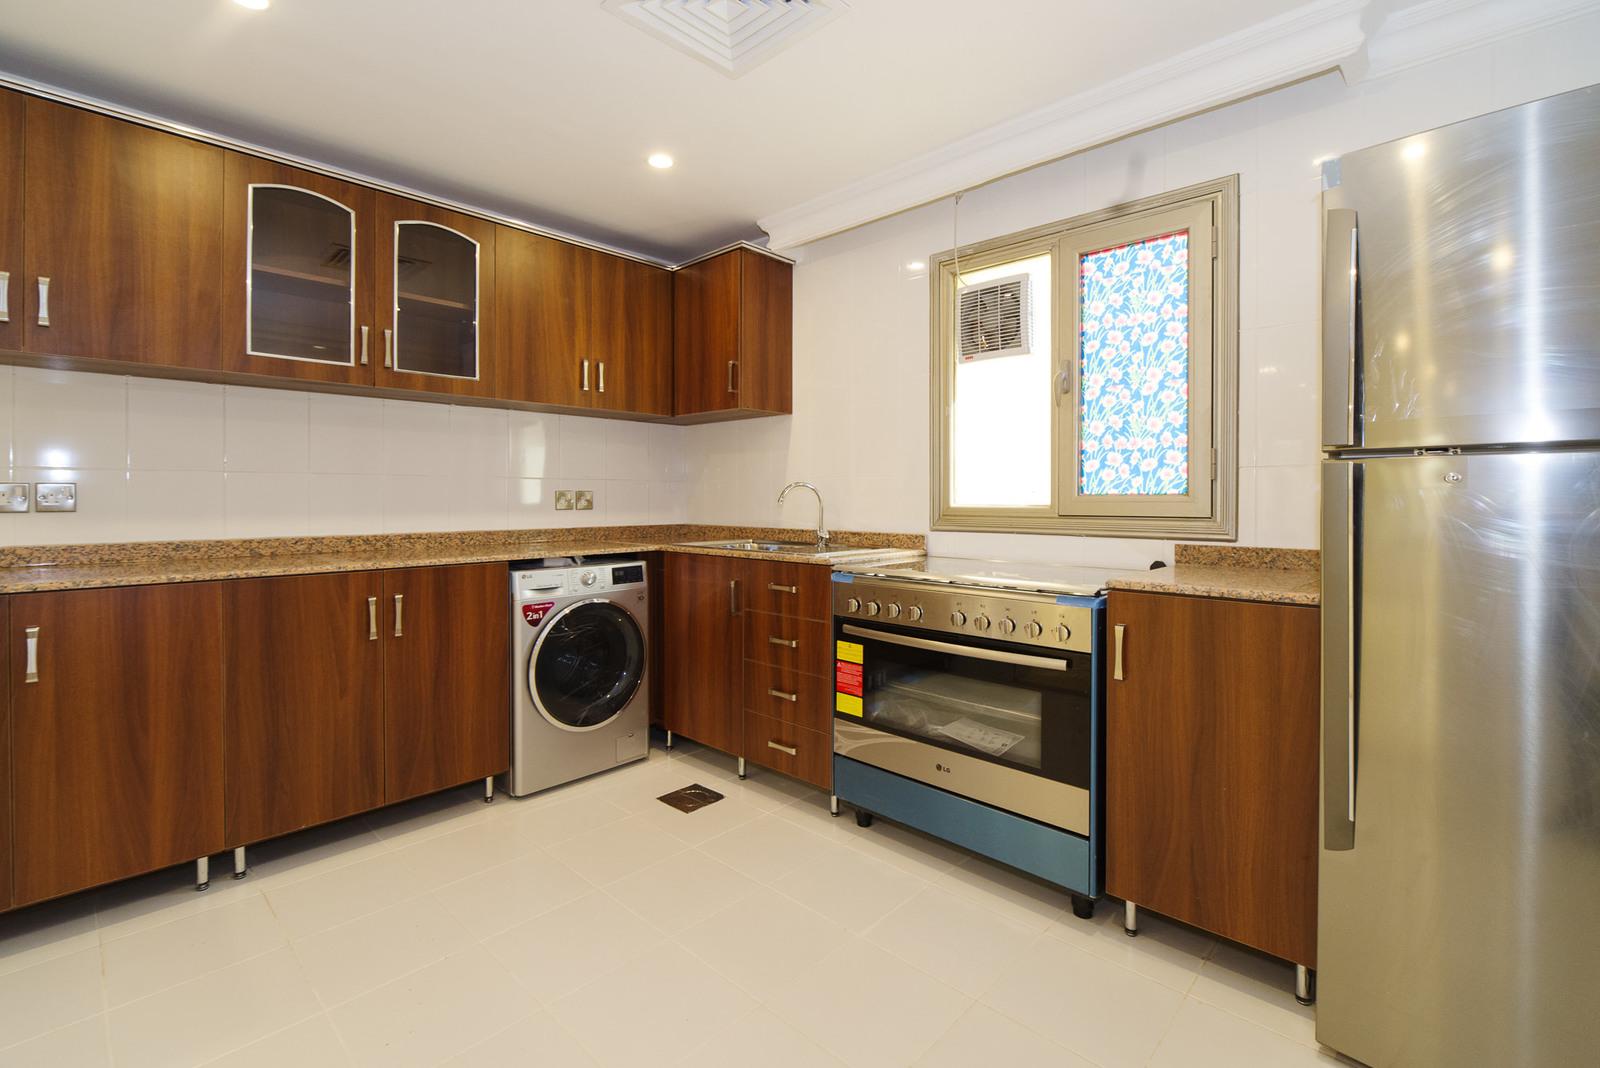 Salwa – newly rennovated, unfurnished, three bedroom ground floor apartment